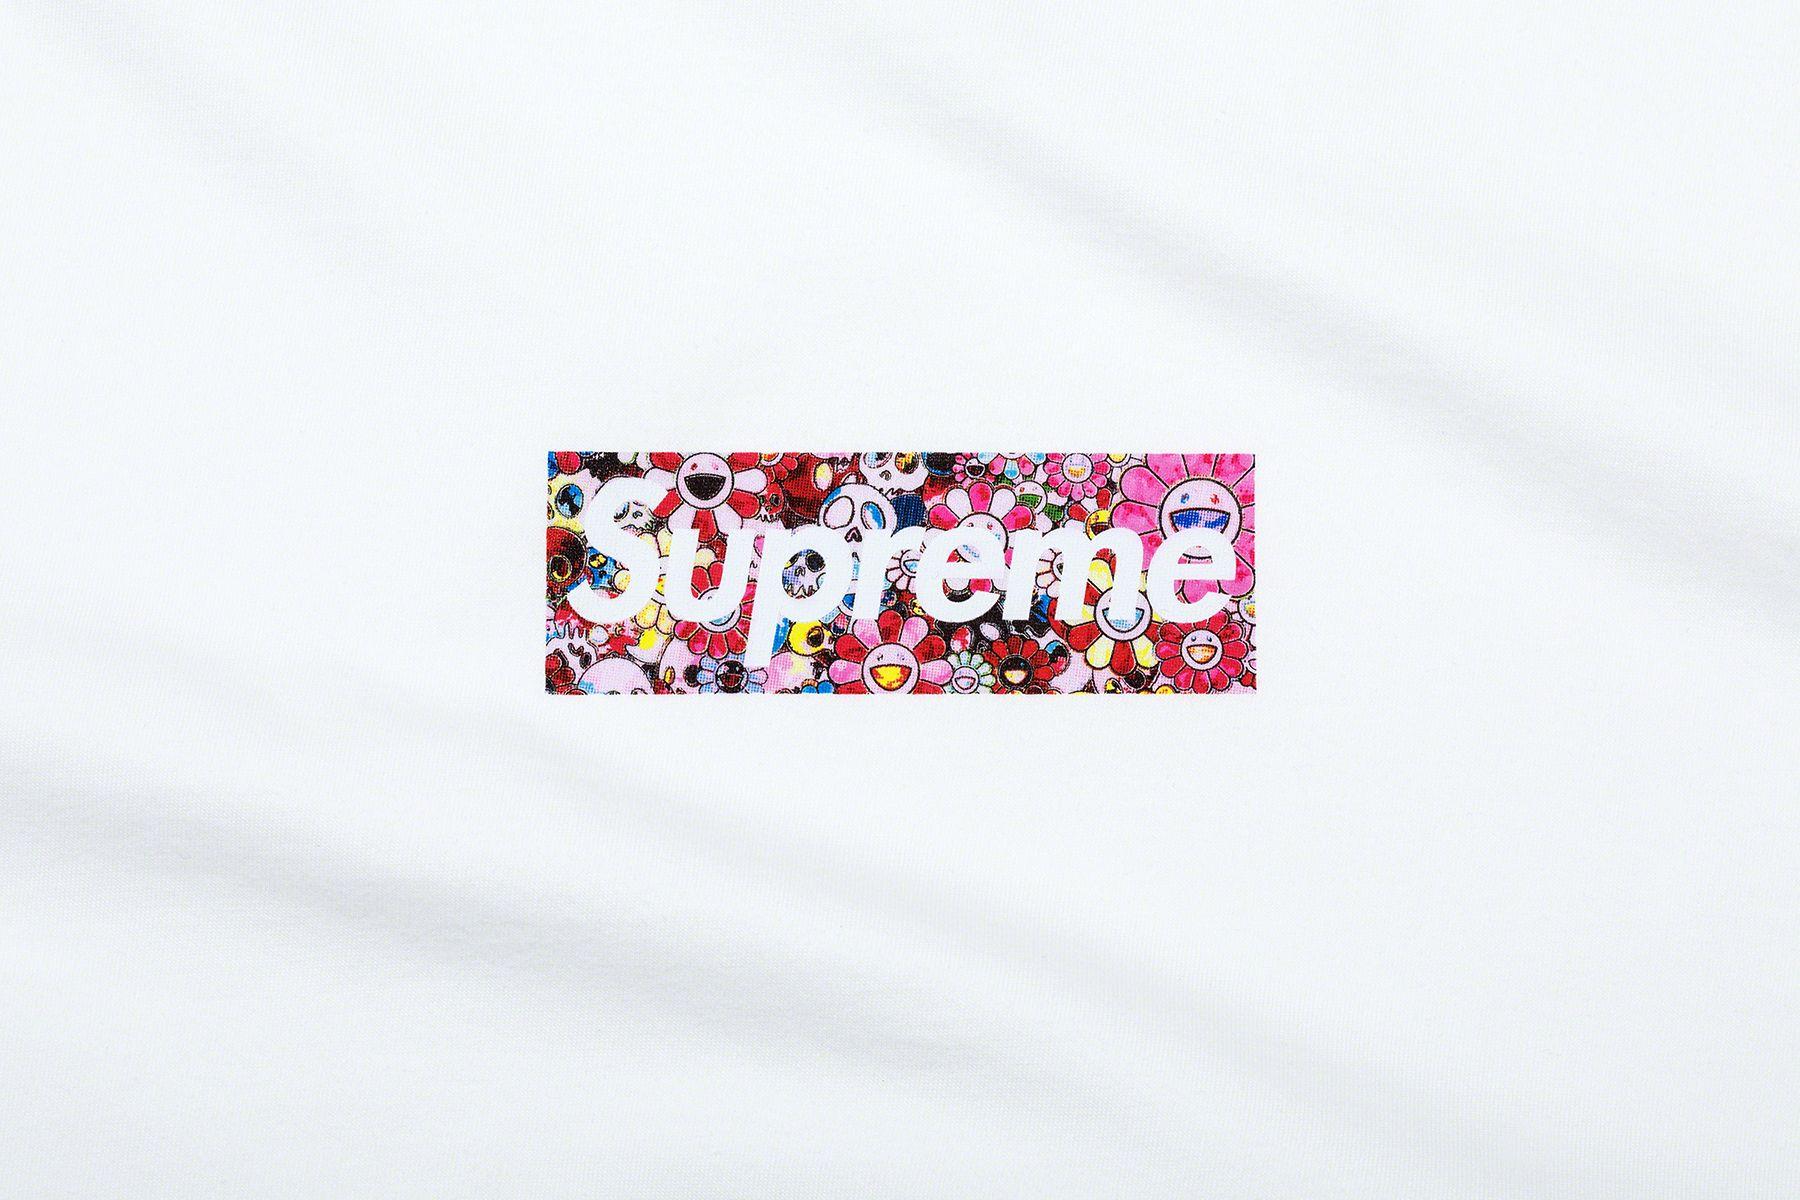 Takashi Murakami x Supreme - благотворительная футболка для борьбы с коронавирусом